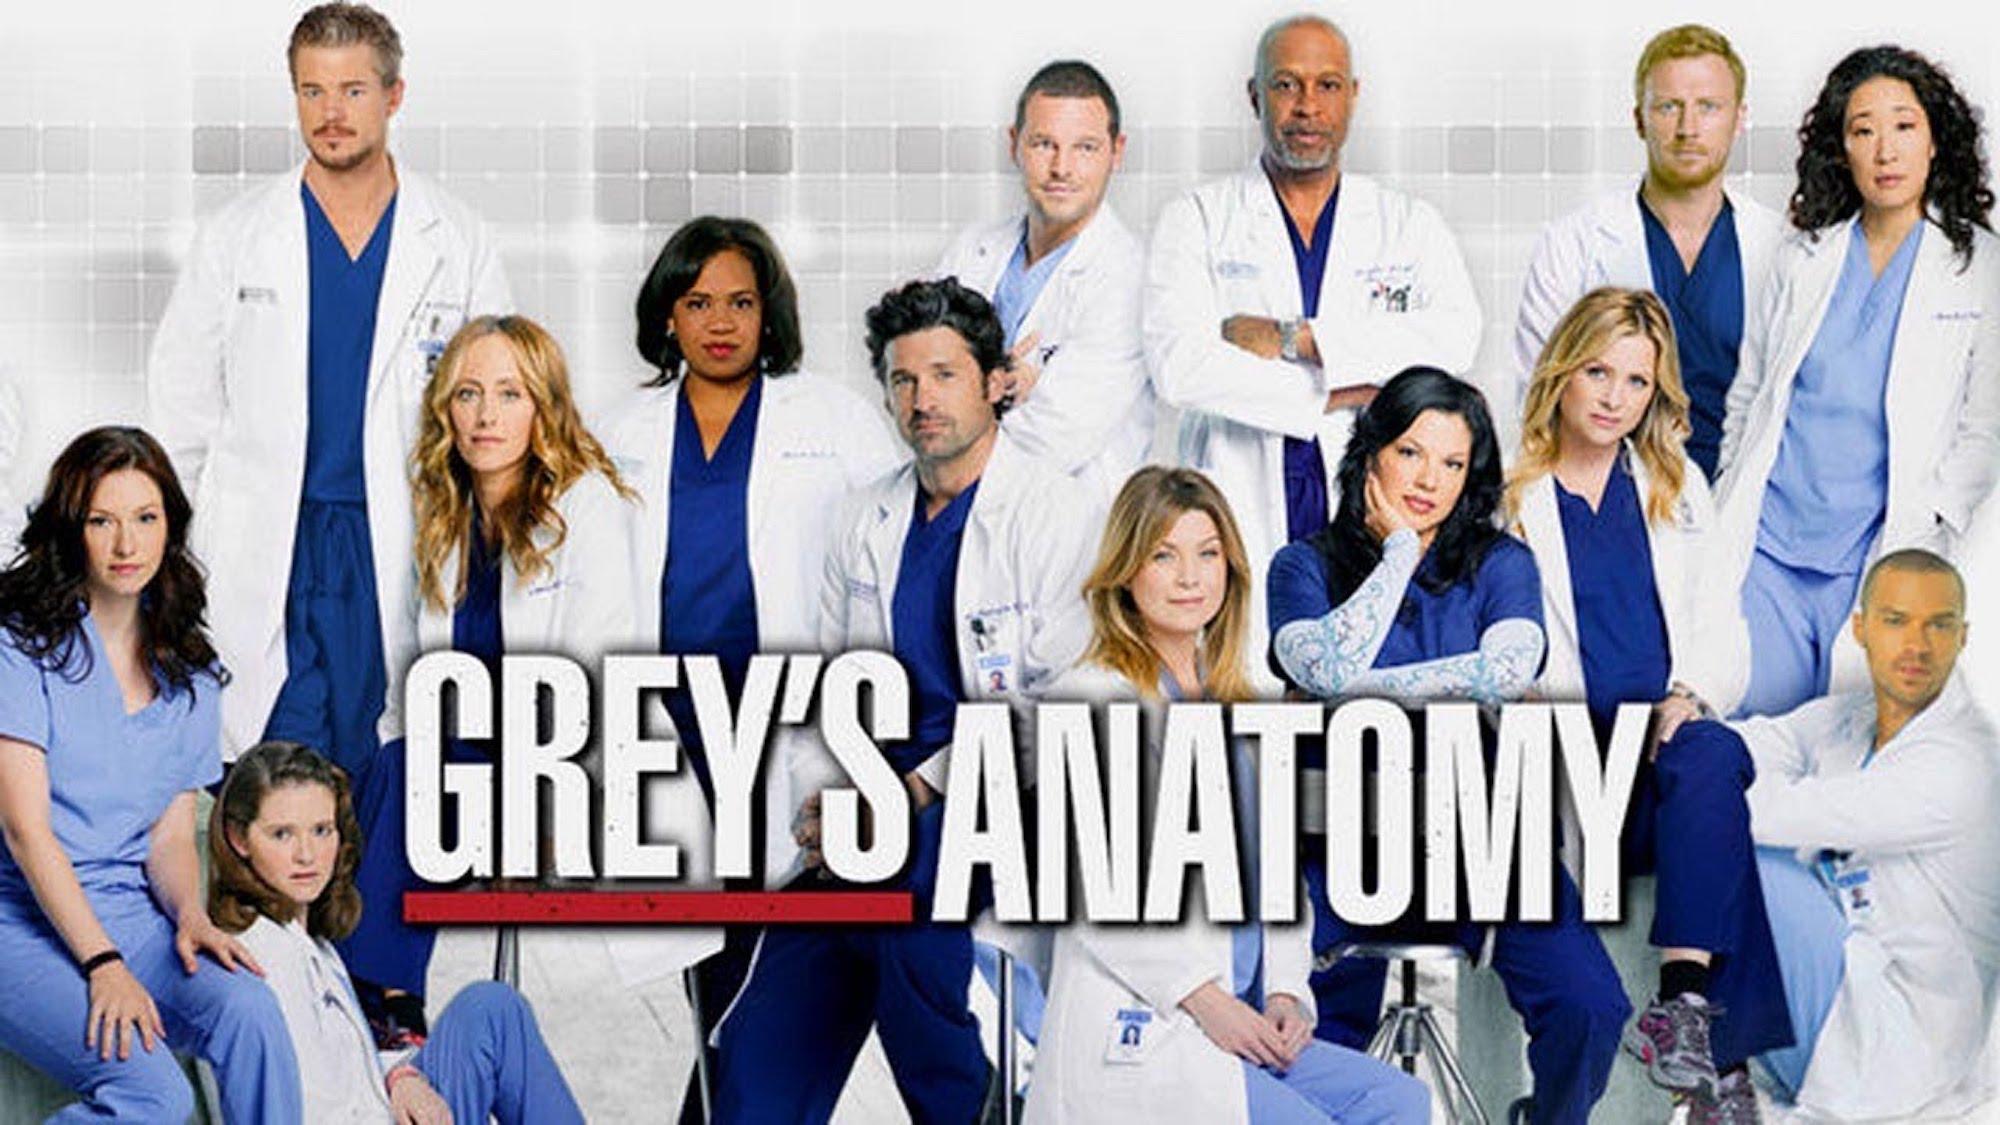 Greys Anatomy 13